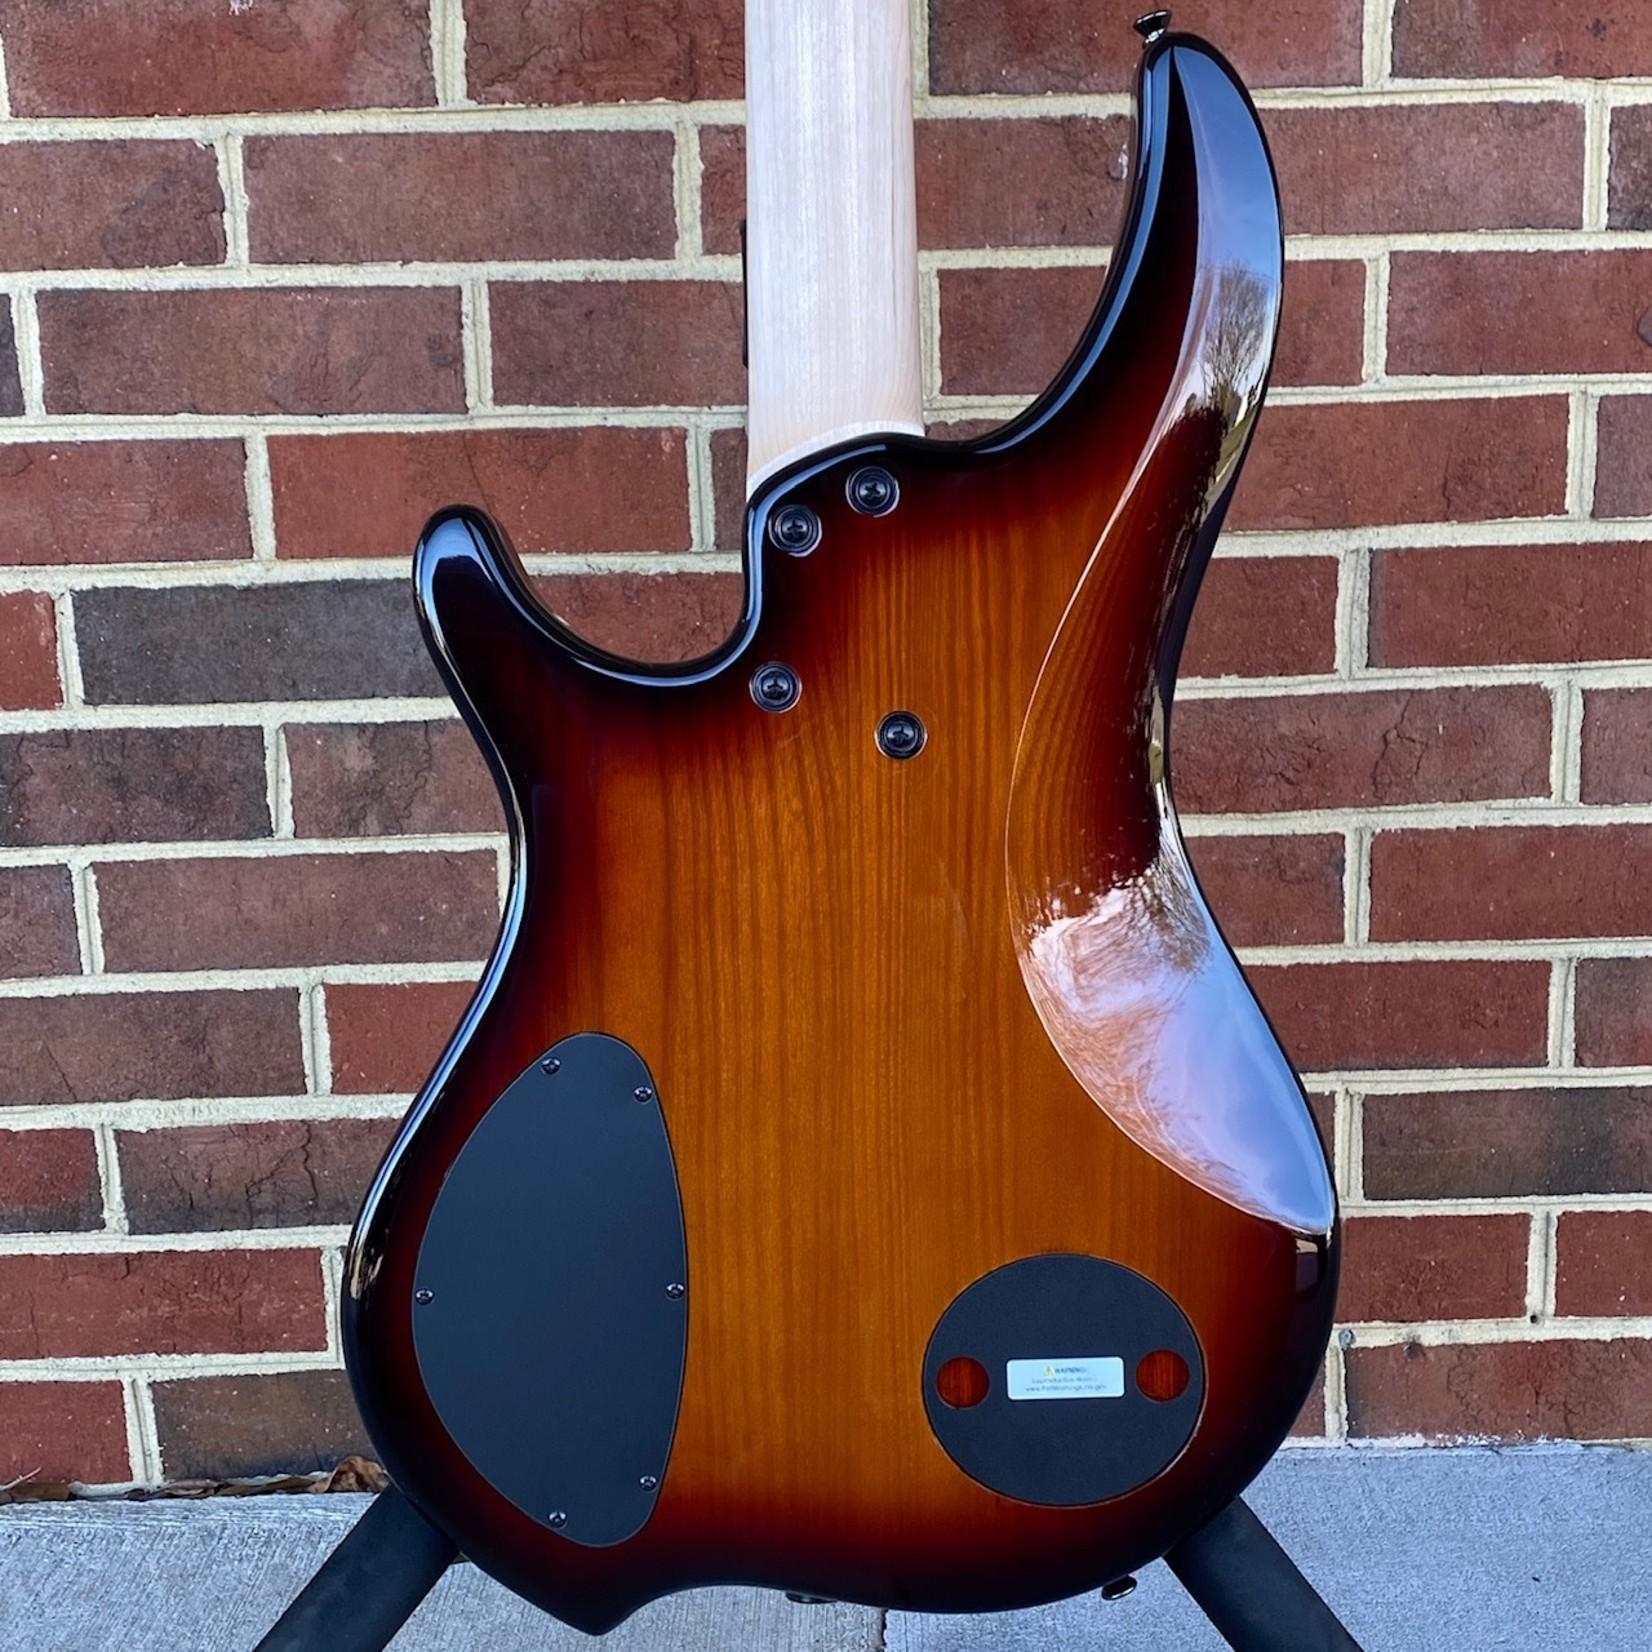 Dingwall Dingwall Combustion 4-String, 3x Pickups, Vintageburst, Quilted Maple Top, Pau Ferro Fretboard, Dingwall Gig Bag